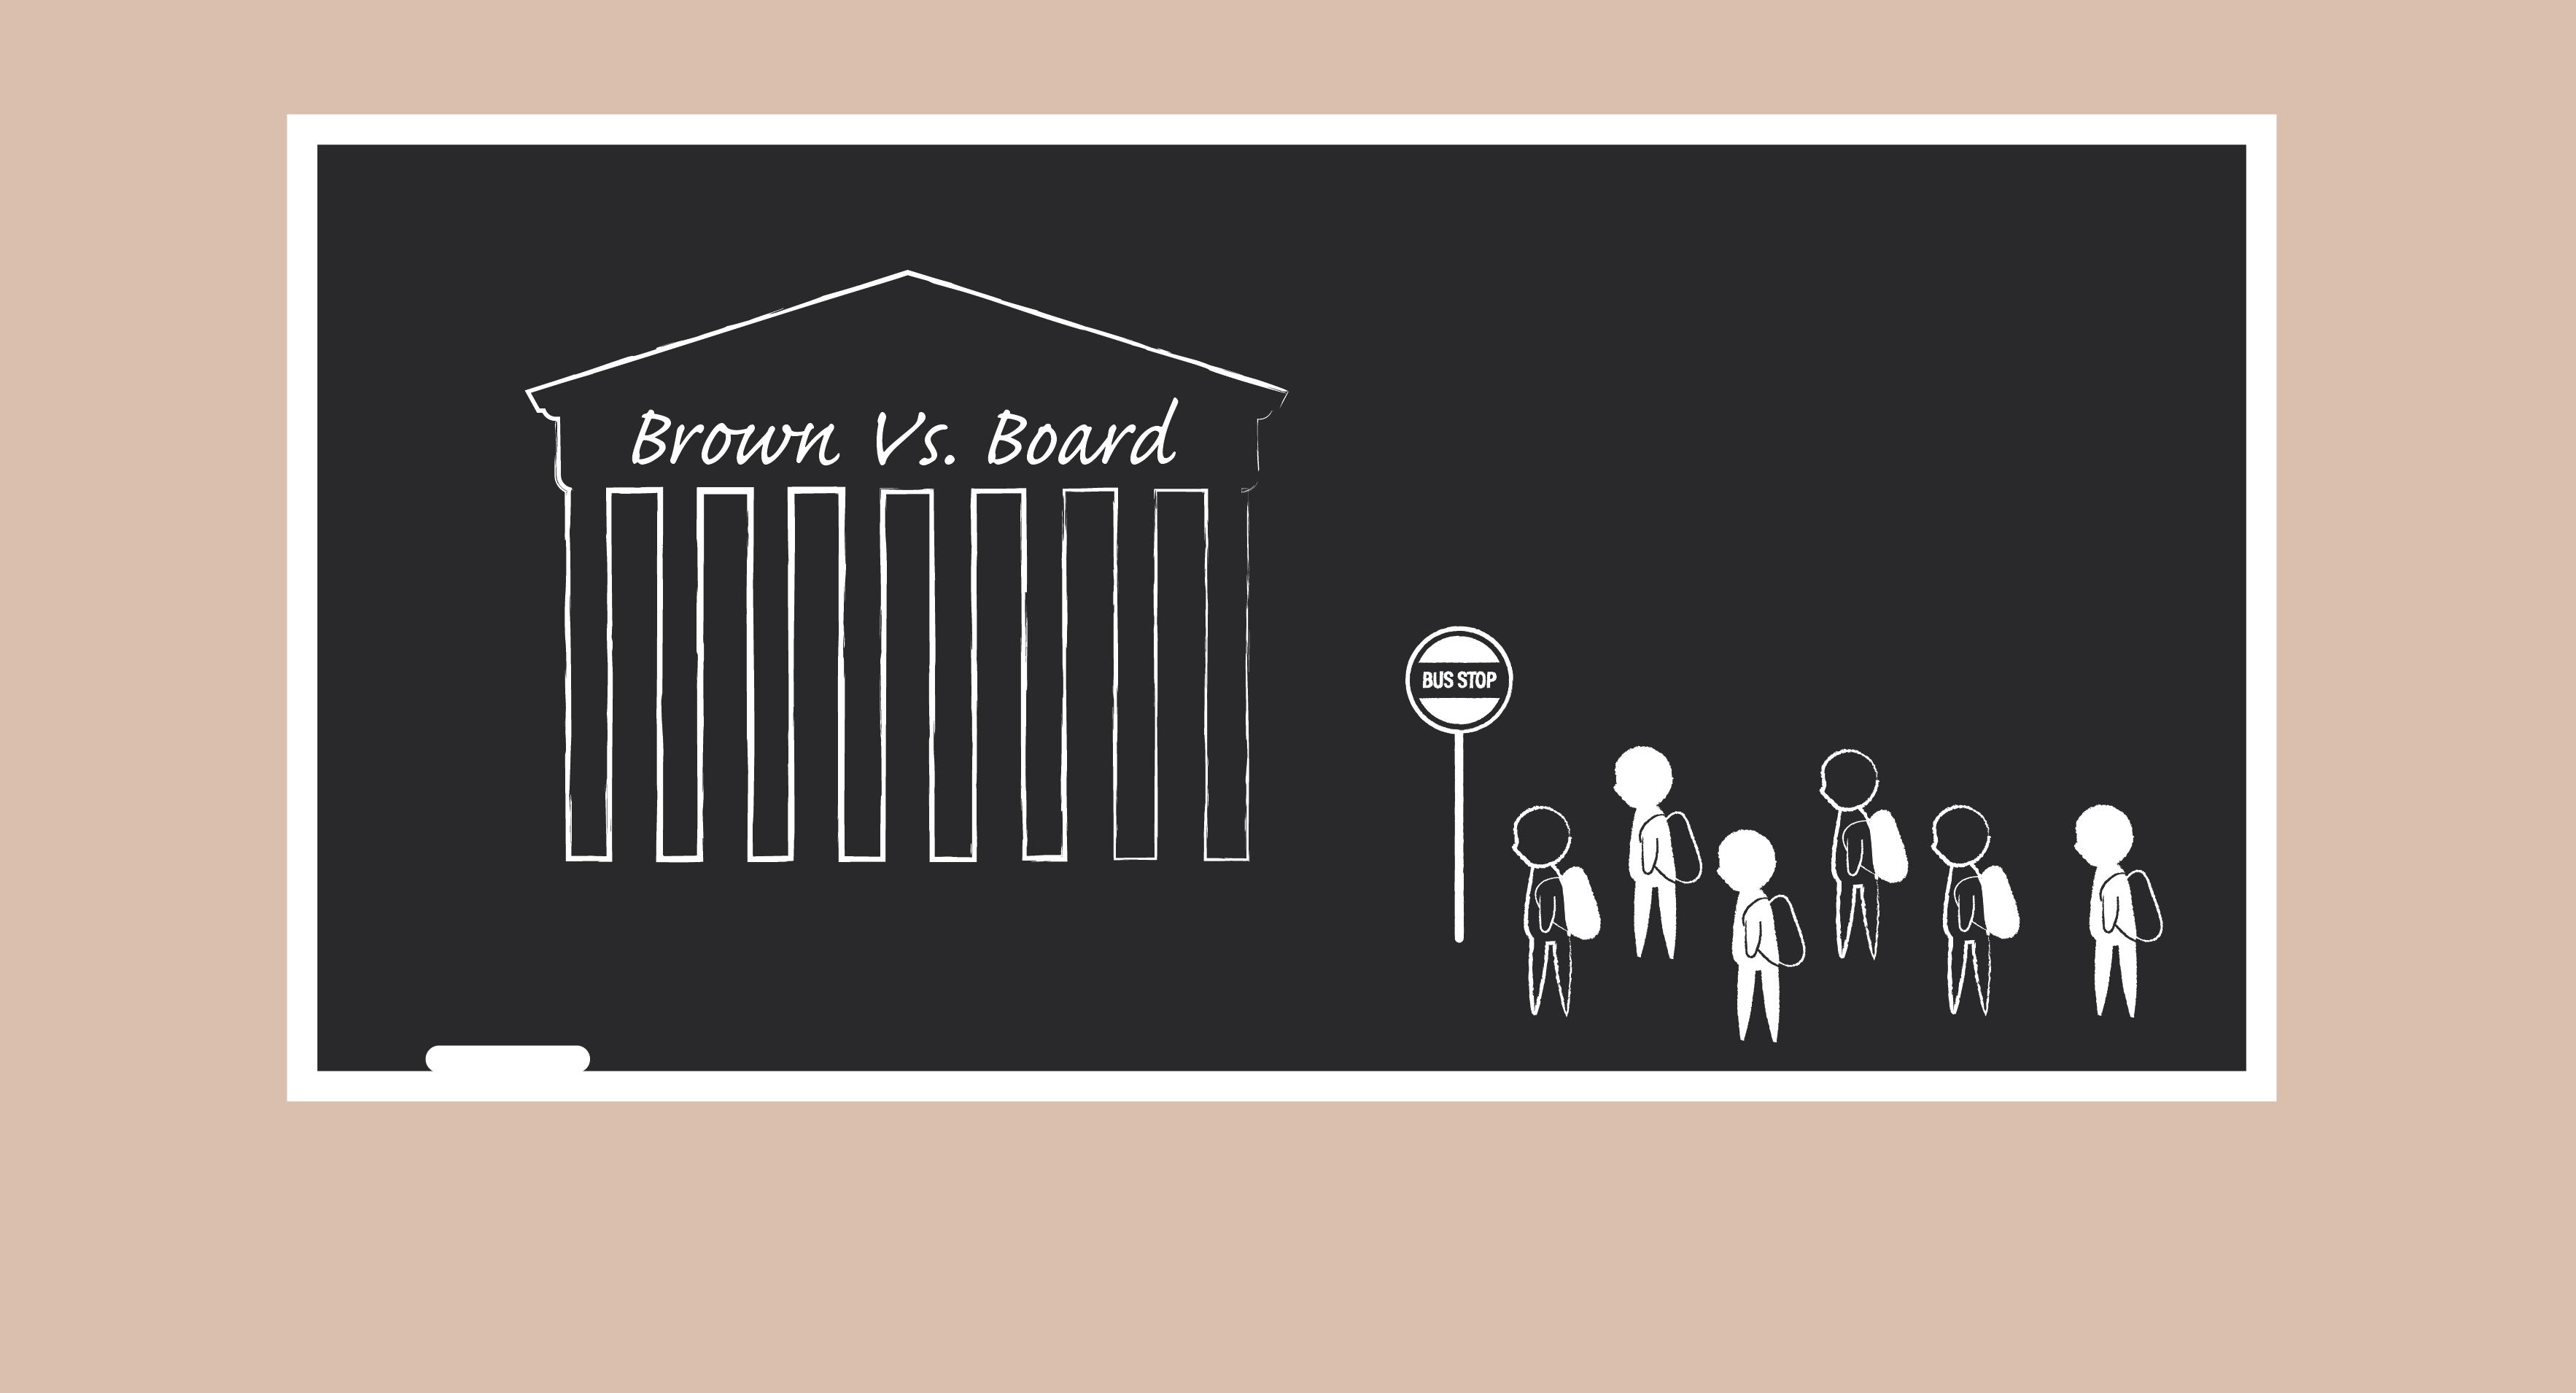 Panelists Discuss Lasting Effects of Segregation in Schools